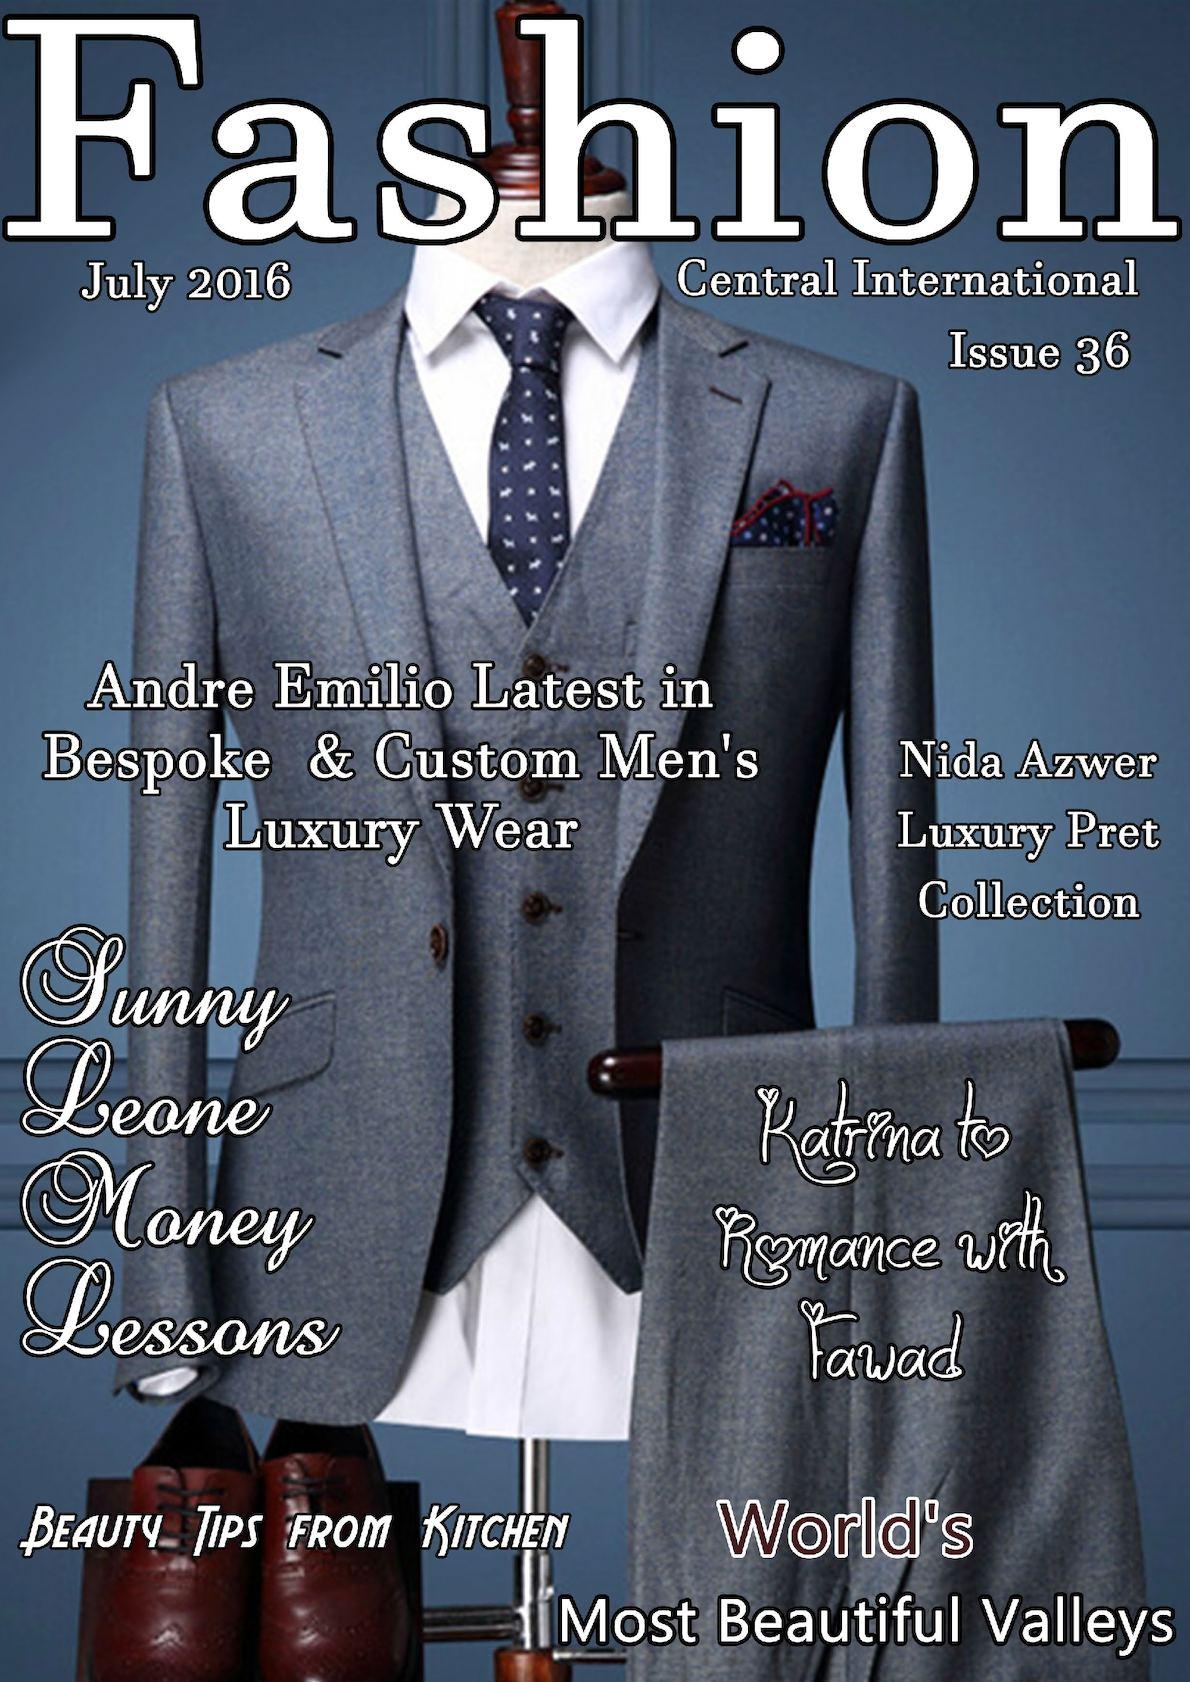 Fashion Central International Magazine August Issue 2016